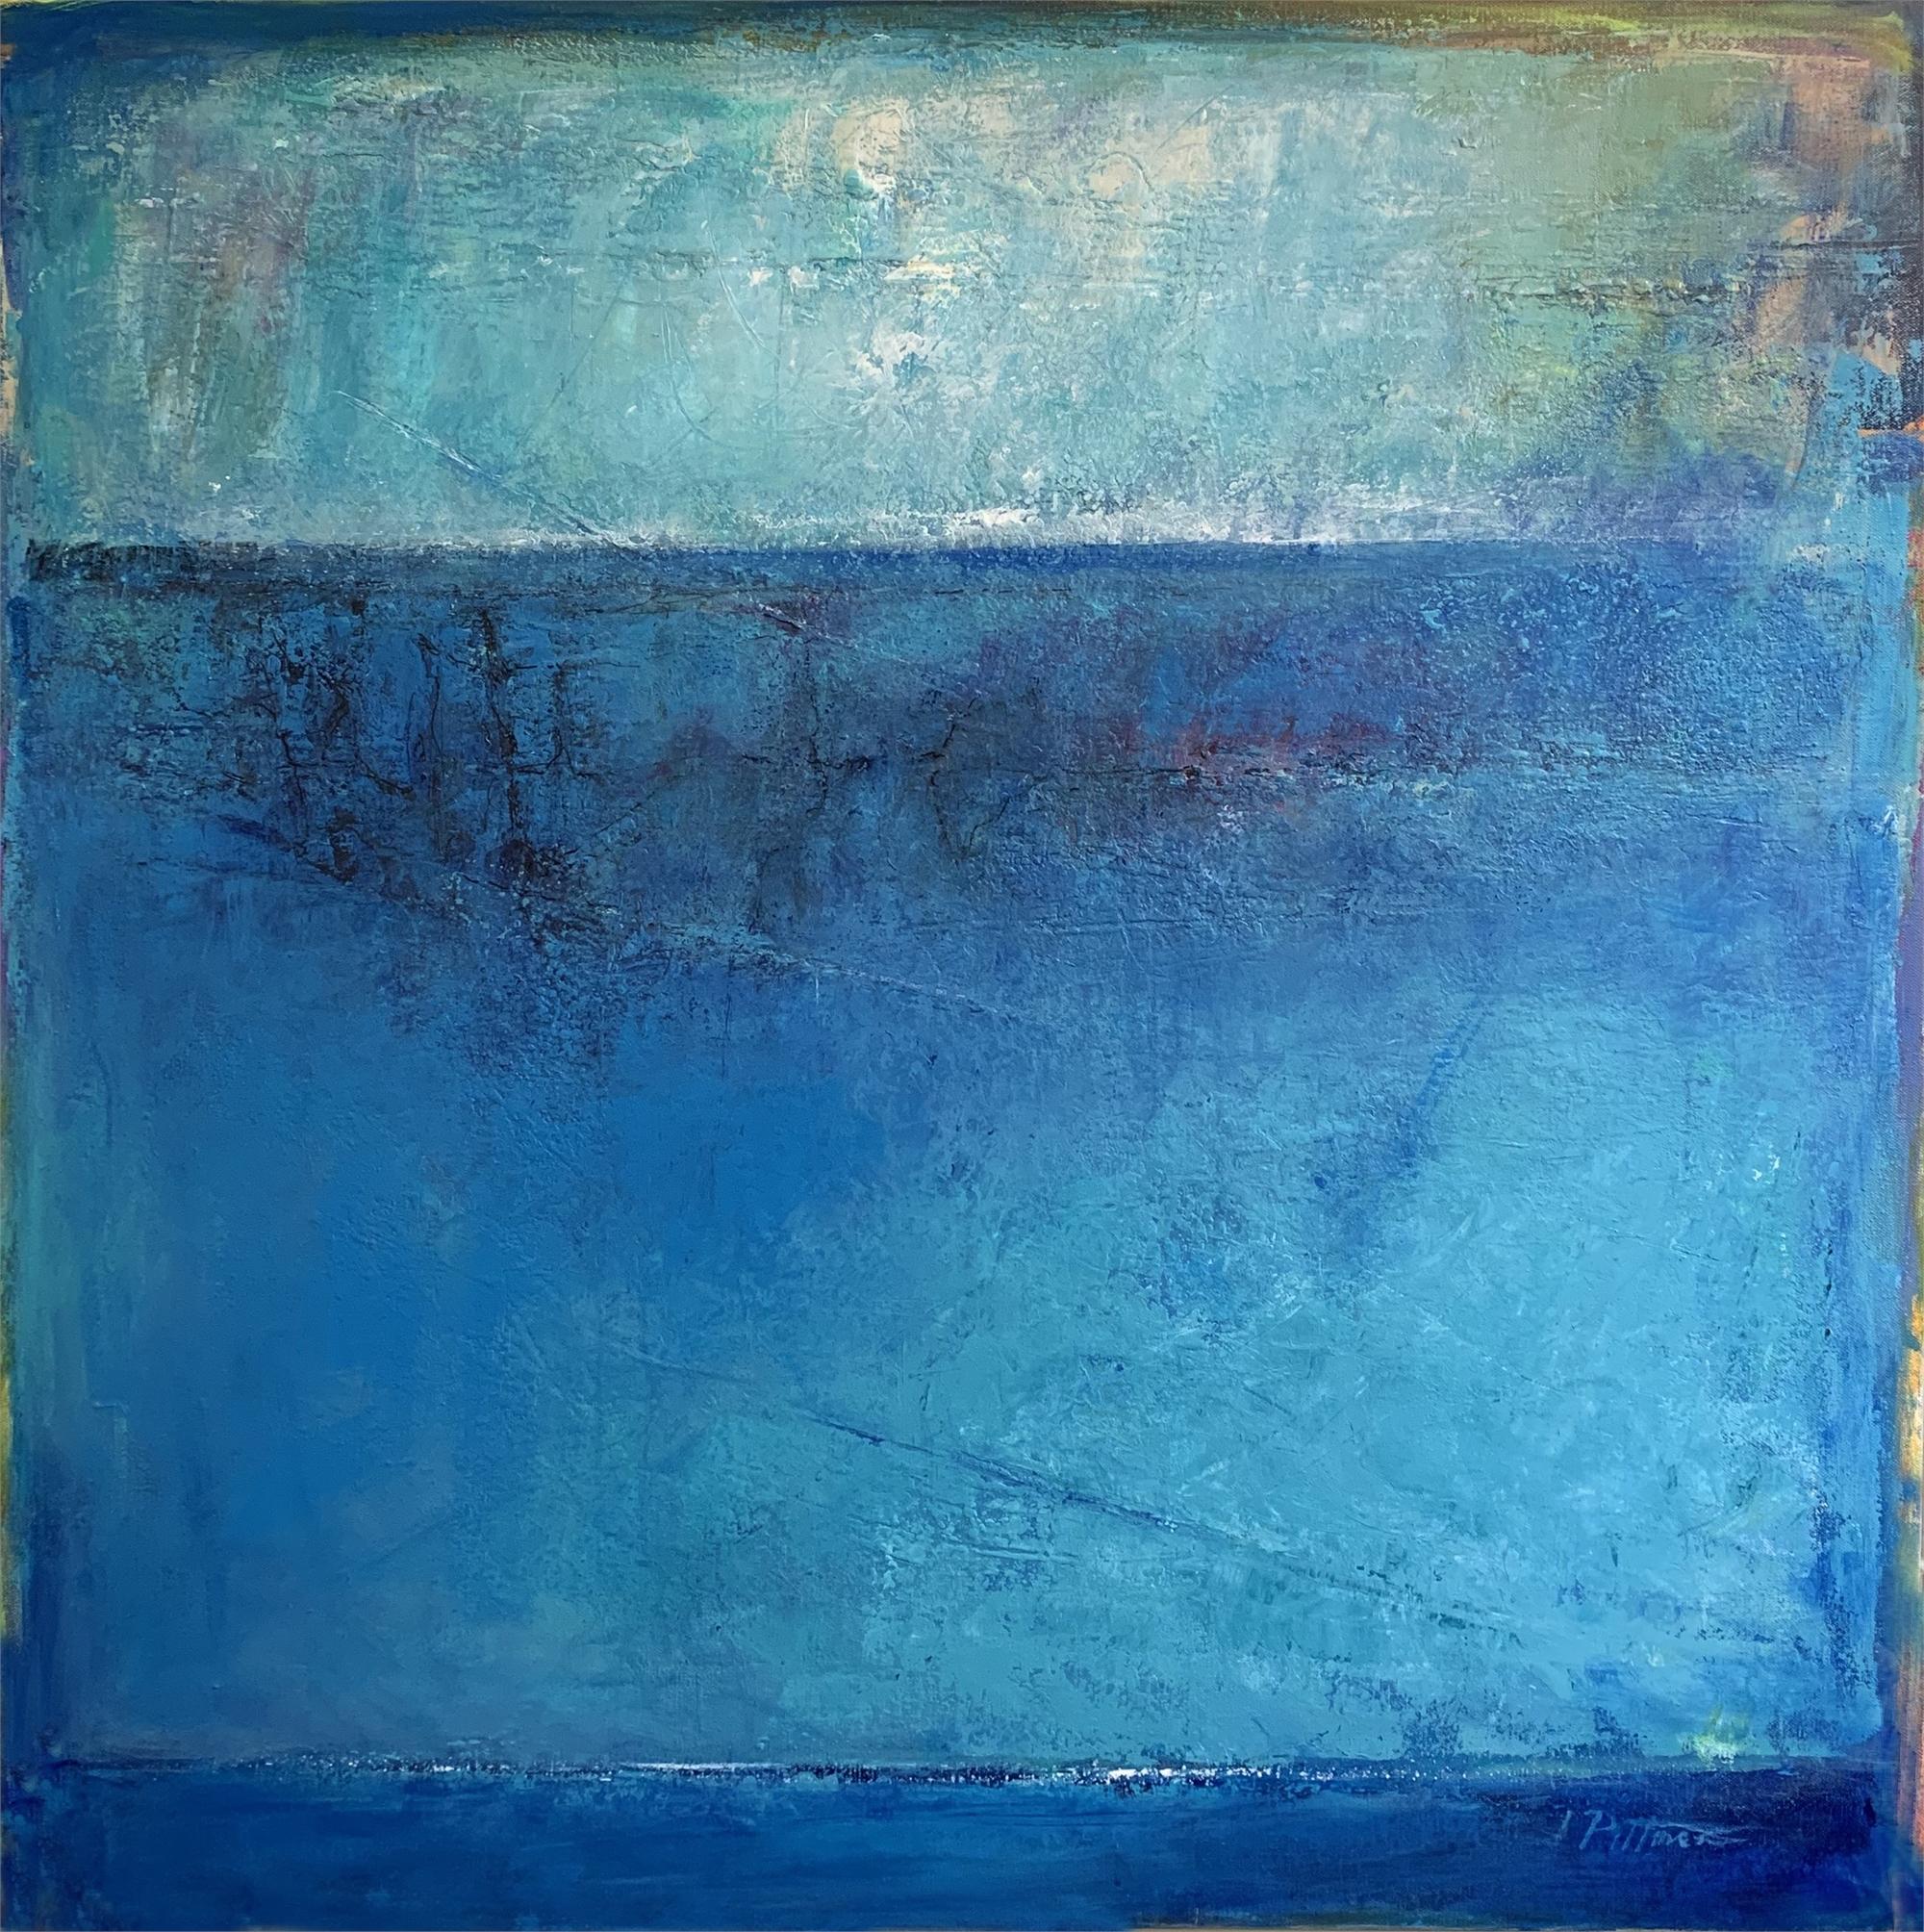 Ocean View by Jim Pittman